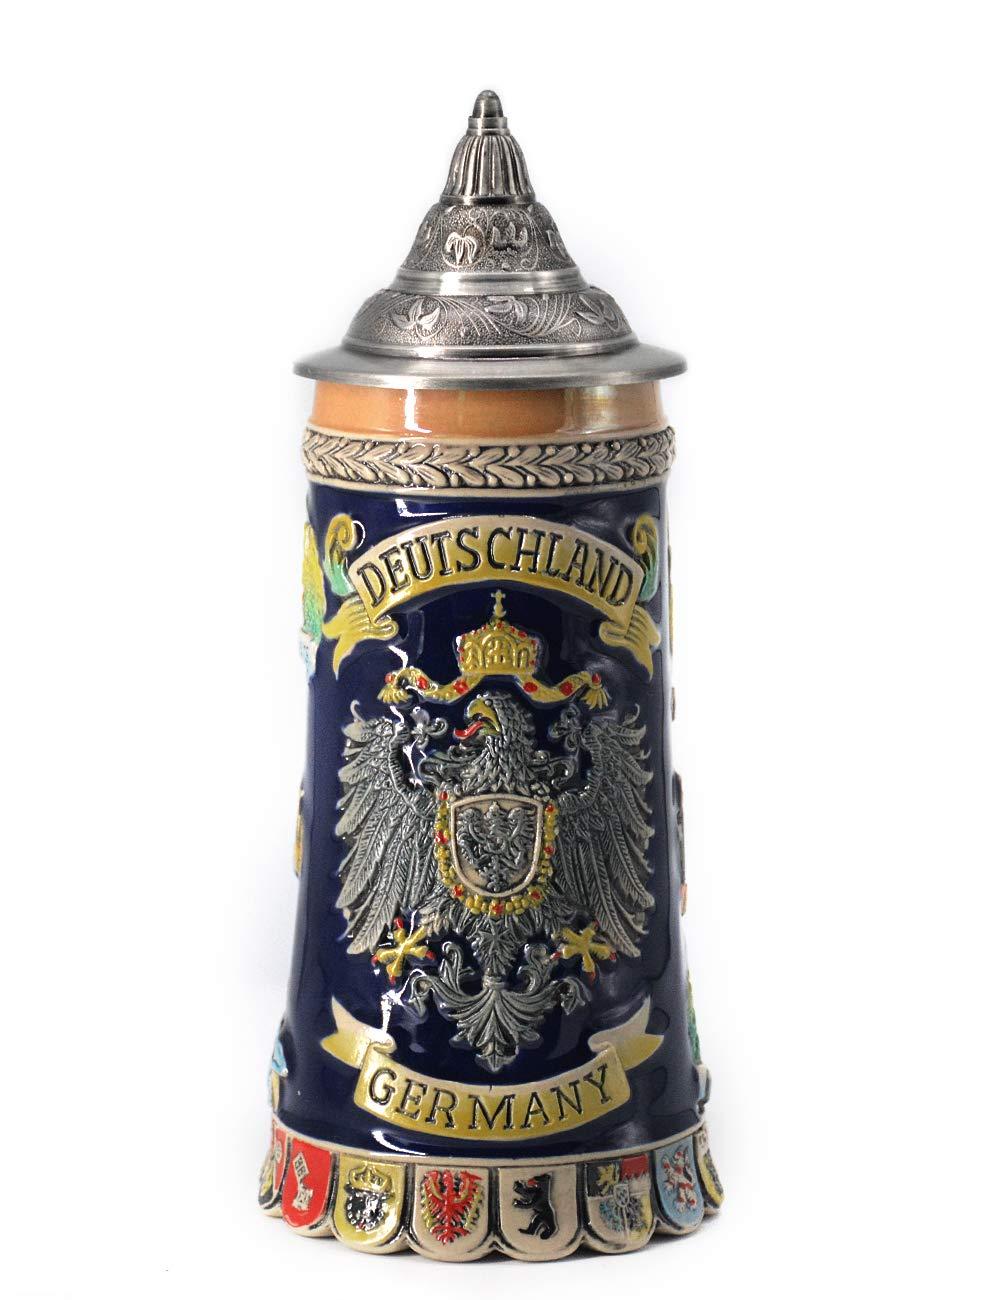 HomeBerry Beer Stein German Beer Stein With Lid Bierkrug Bier Stein Mug Krug Ceramic Beer Stein Steins 0.6L